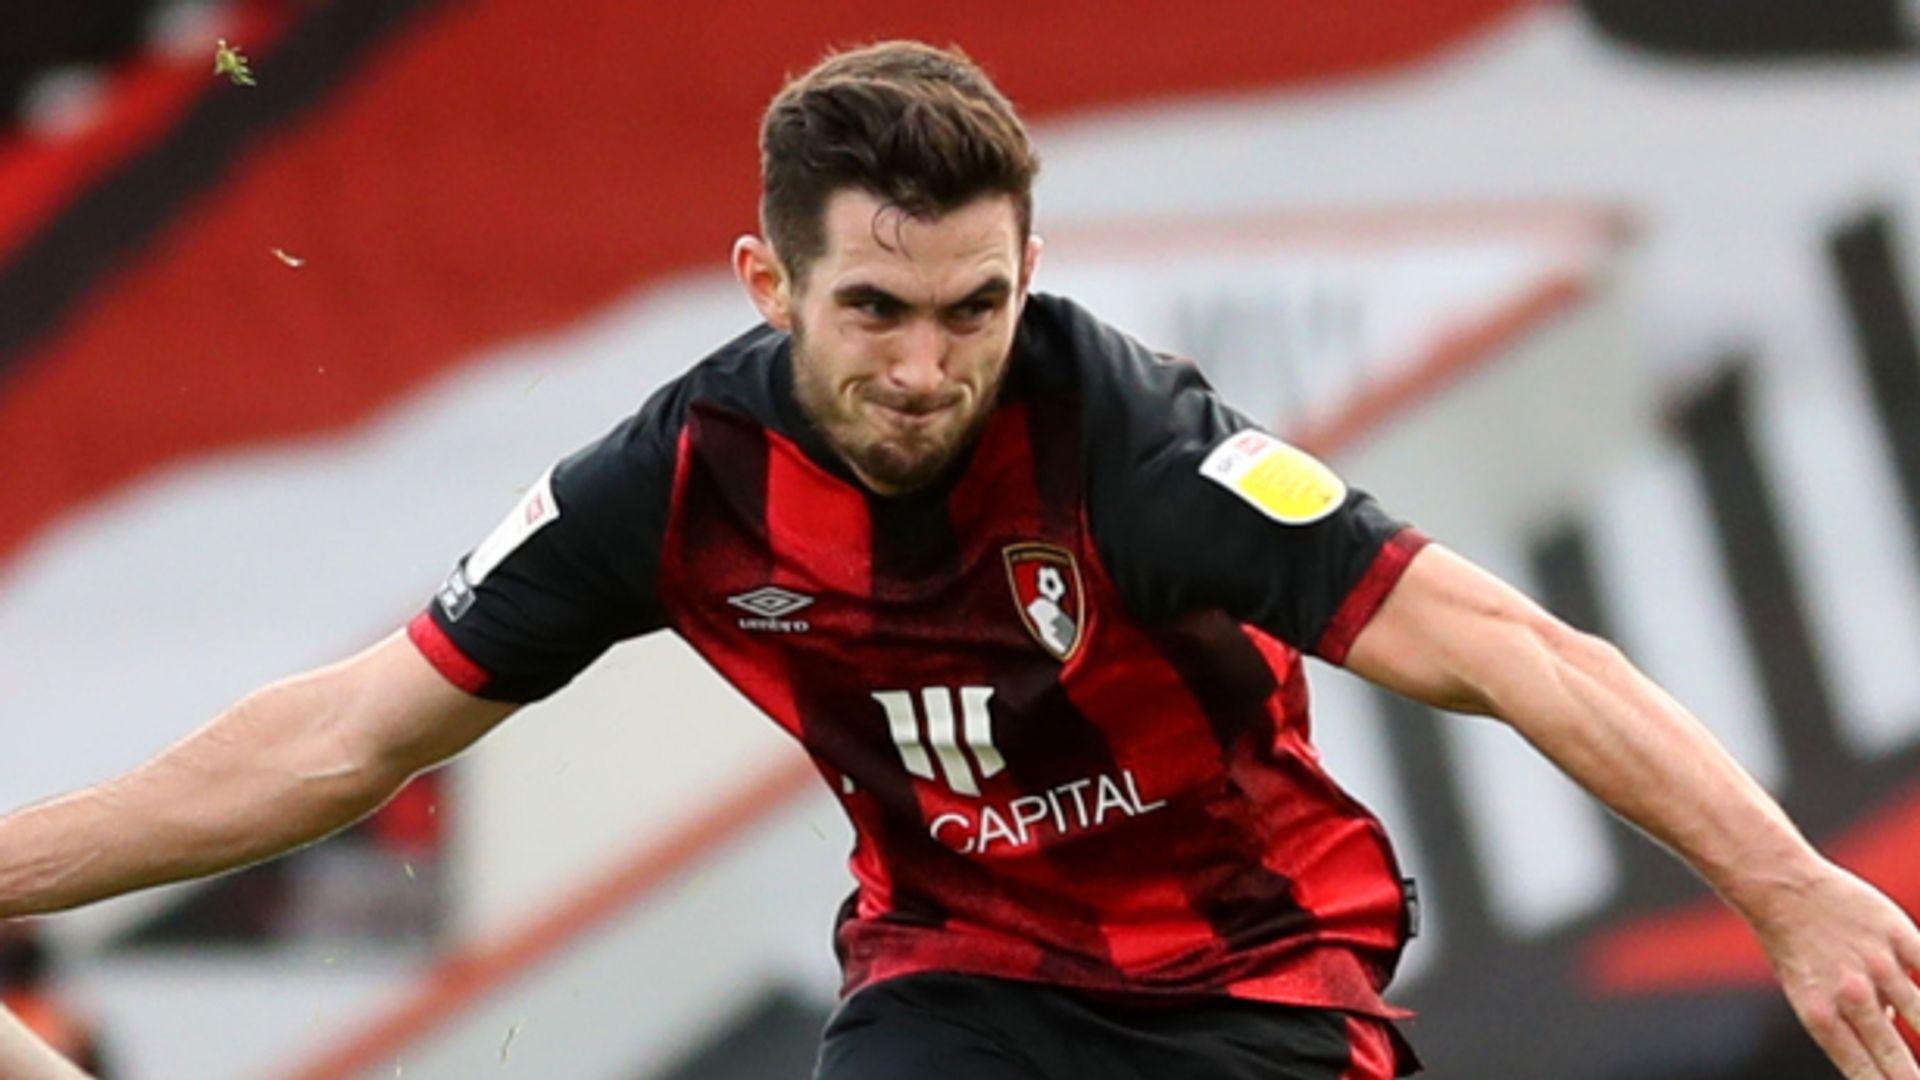 Stunning comeback sends Bournemouth top